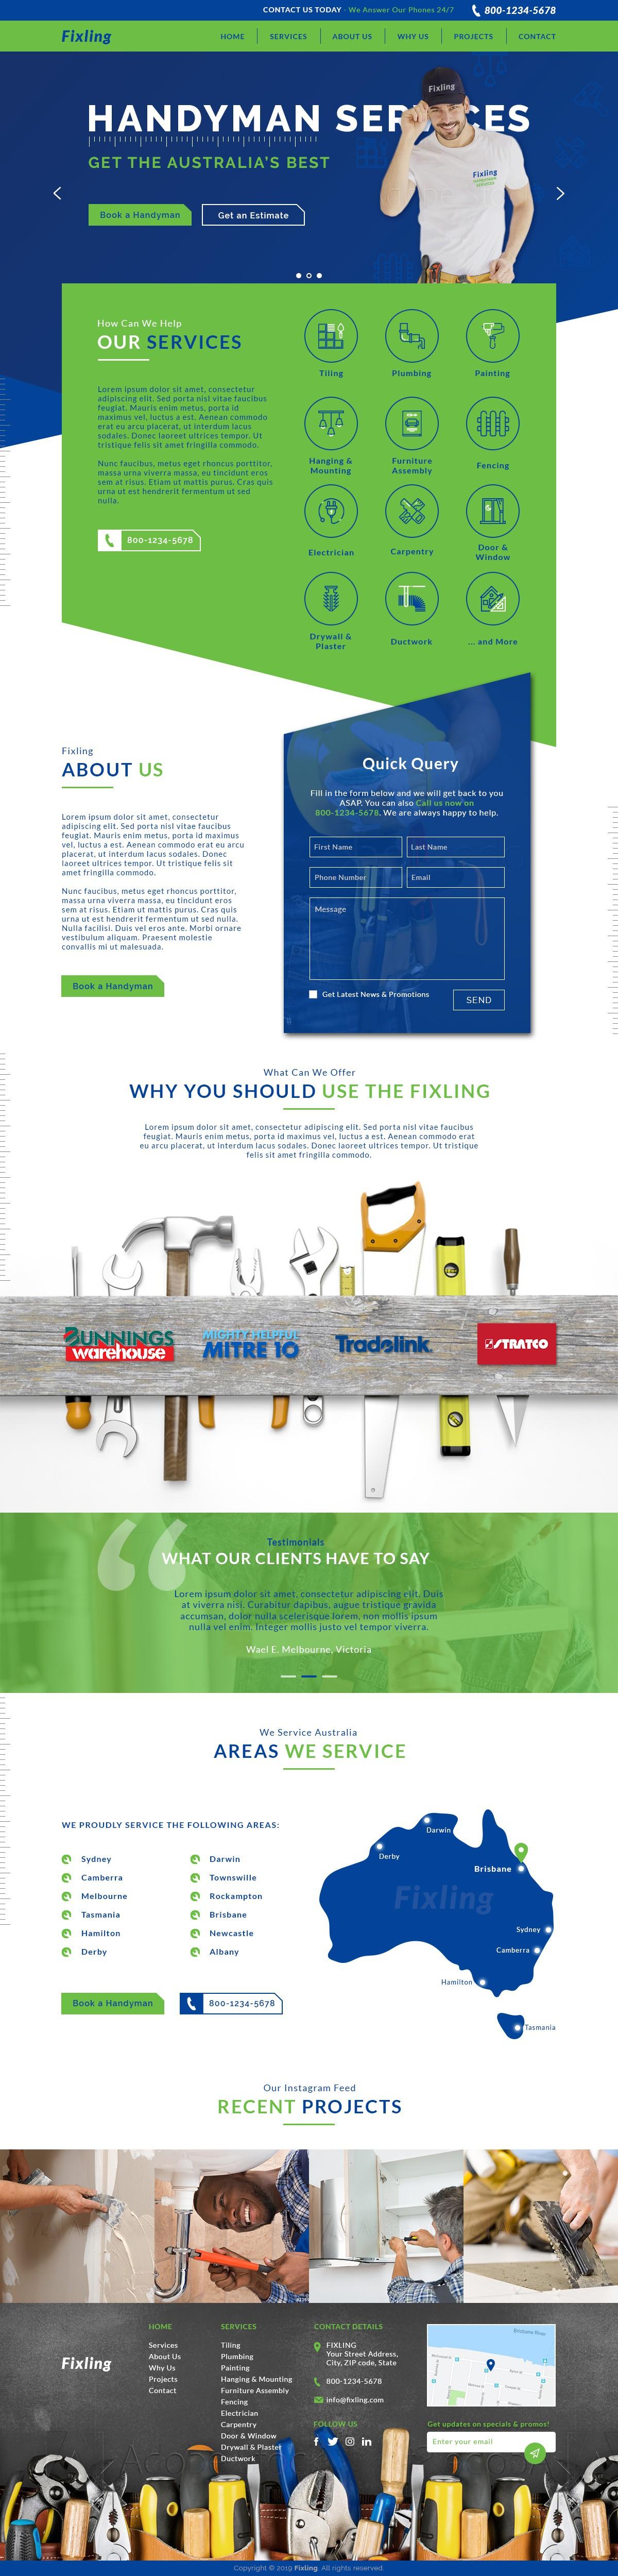 Best Customer Experience Handyman Company in Australia - Website Design